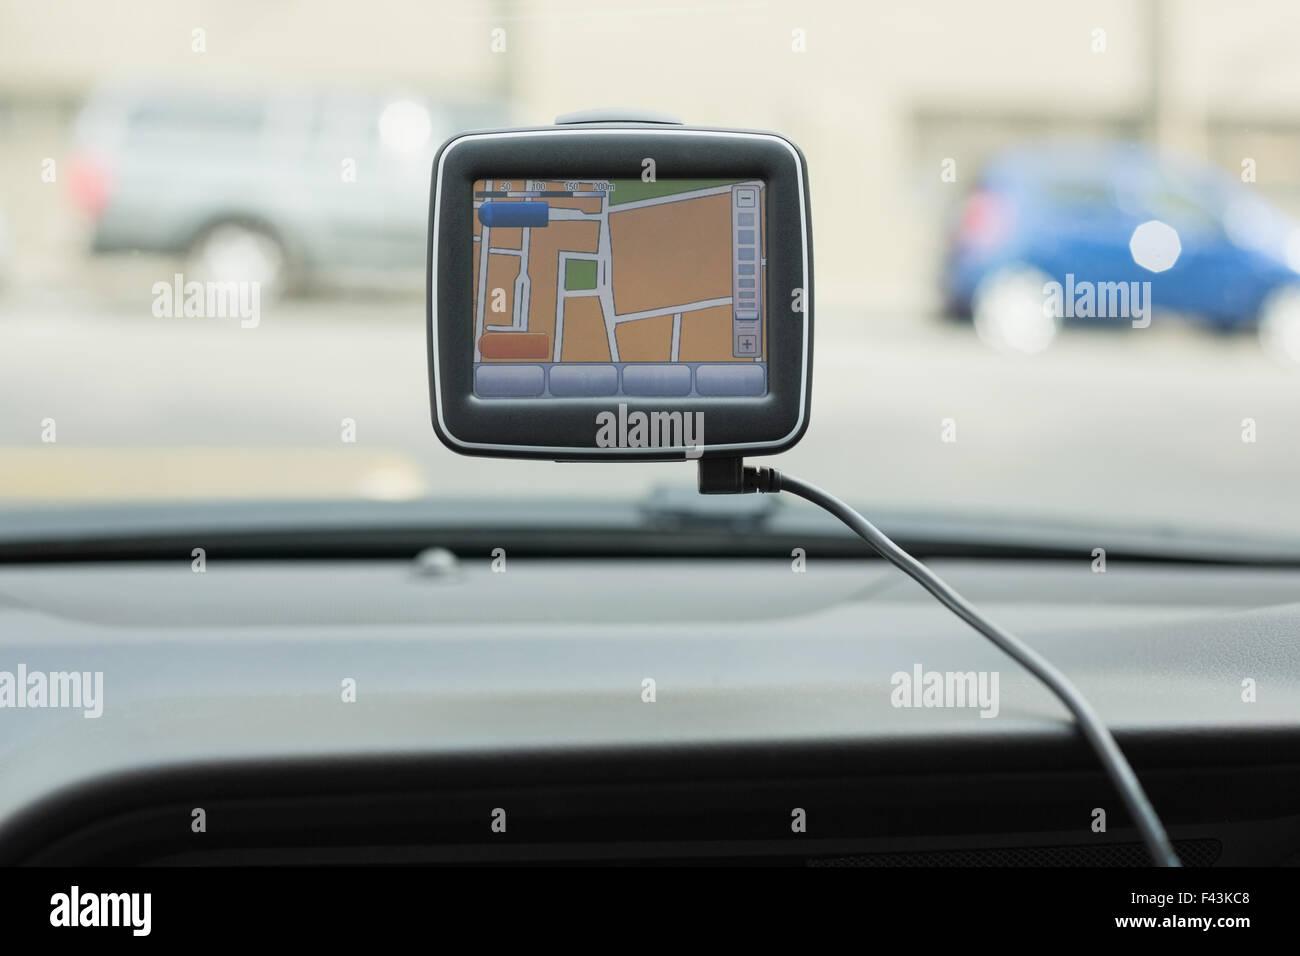 Screen of satellite navigation system - Stock Image